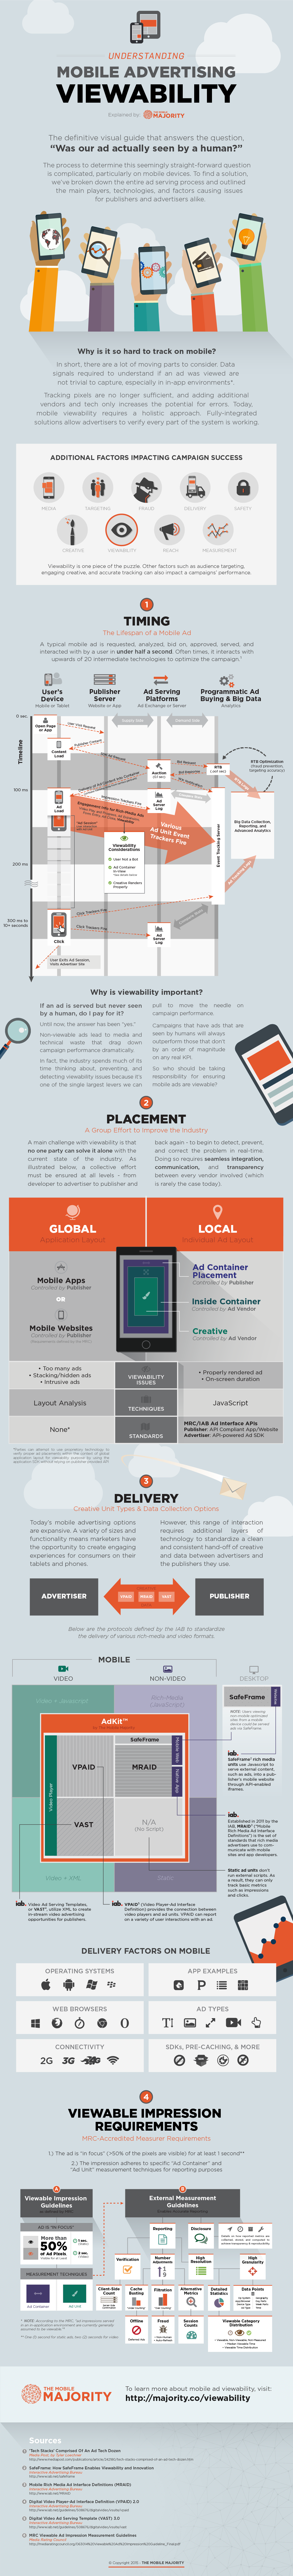 Viewability im Mobile Advertising.